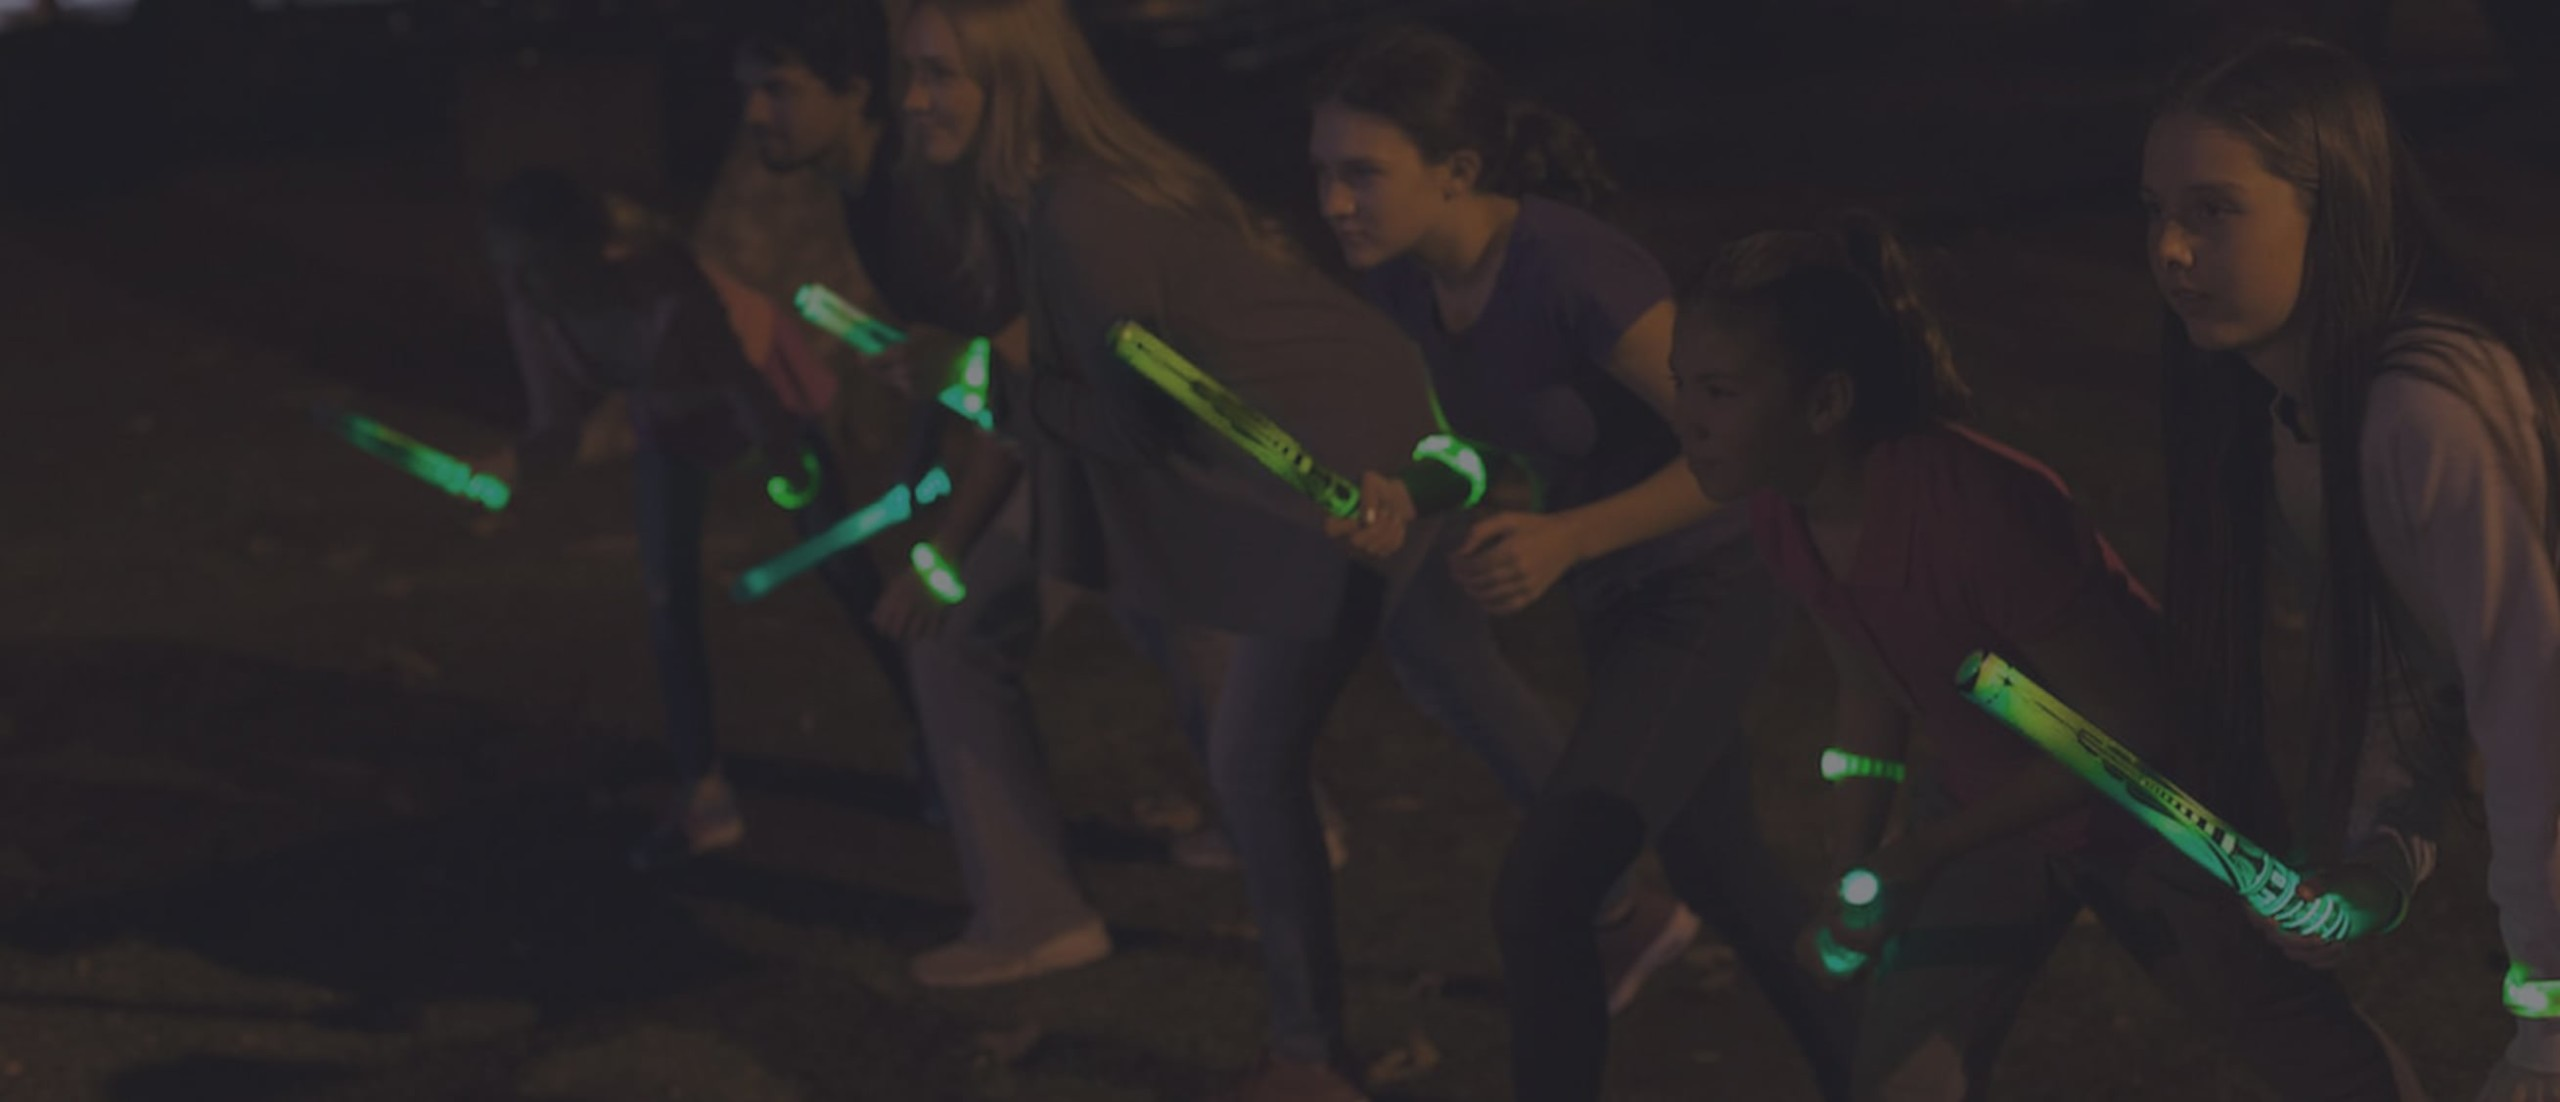 Glow Battle Interactive Light-Up Sword Game